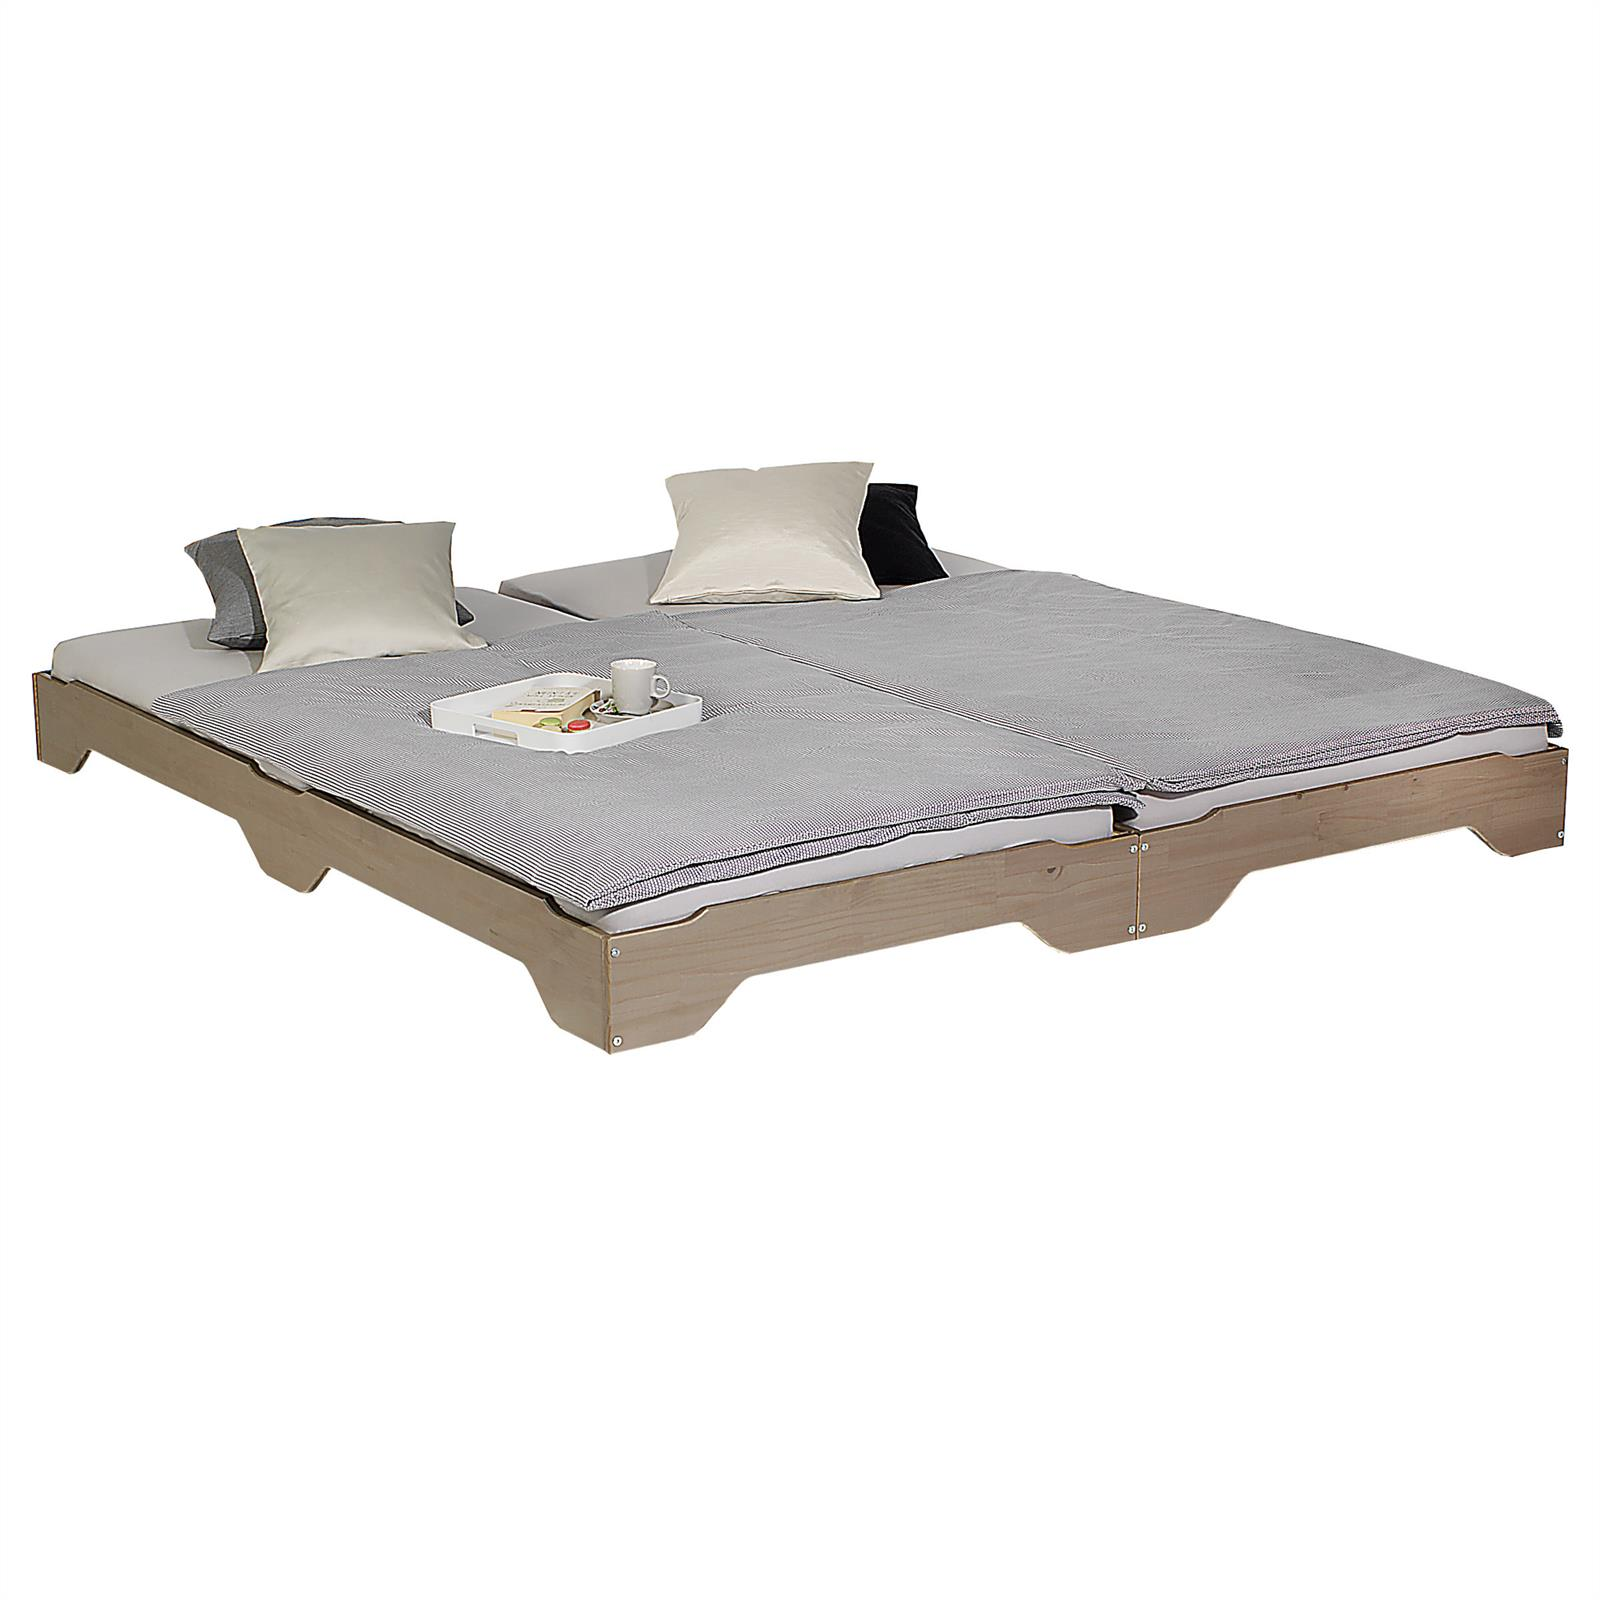 stapelbetten g stebetten doppelbetten einzelbetten kiefer massiv 90x200 farbwahl ebay. Black Bedroom Furniture Sets. Home Design Ideas